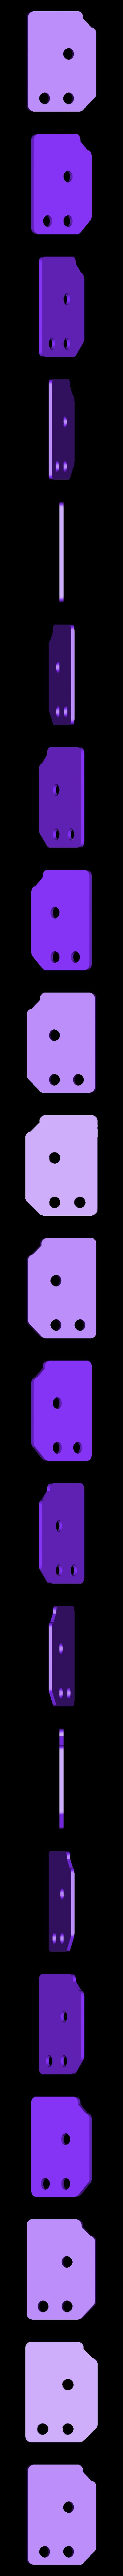 patch4 (1pcs).STL Download STL file Folding Quadcopter 450 Frame • 3D print object, AleksandrDolzhenko